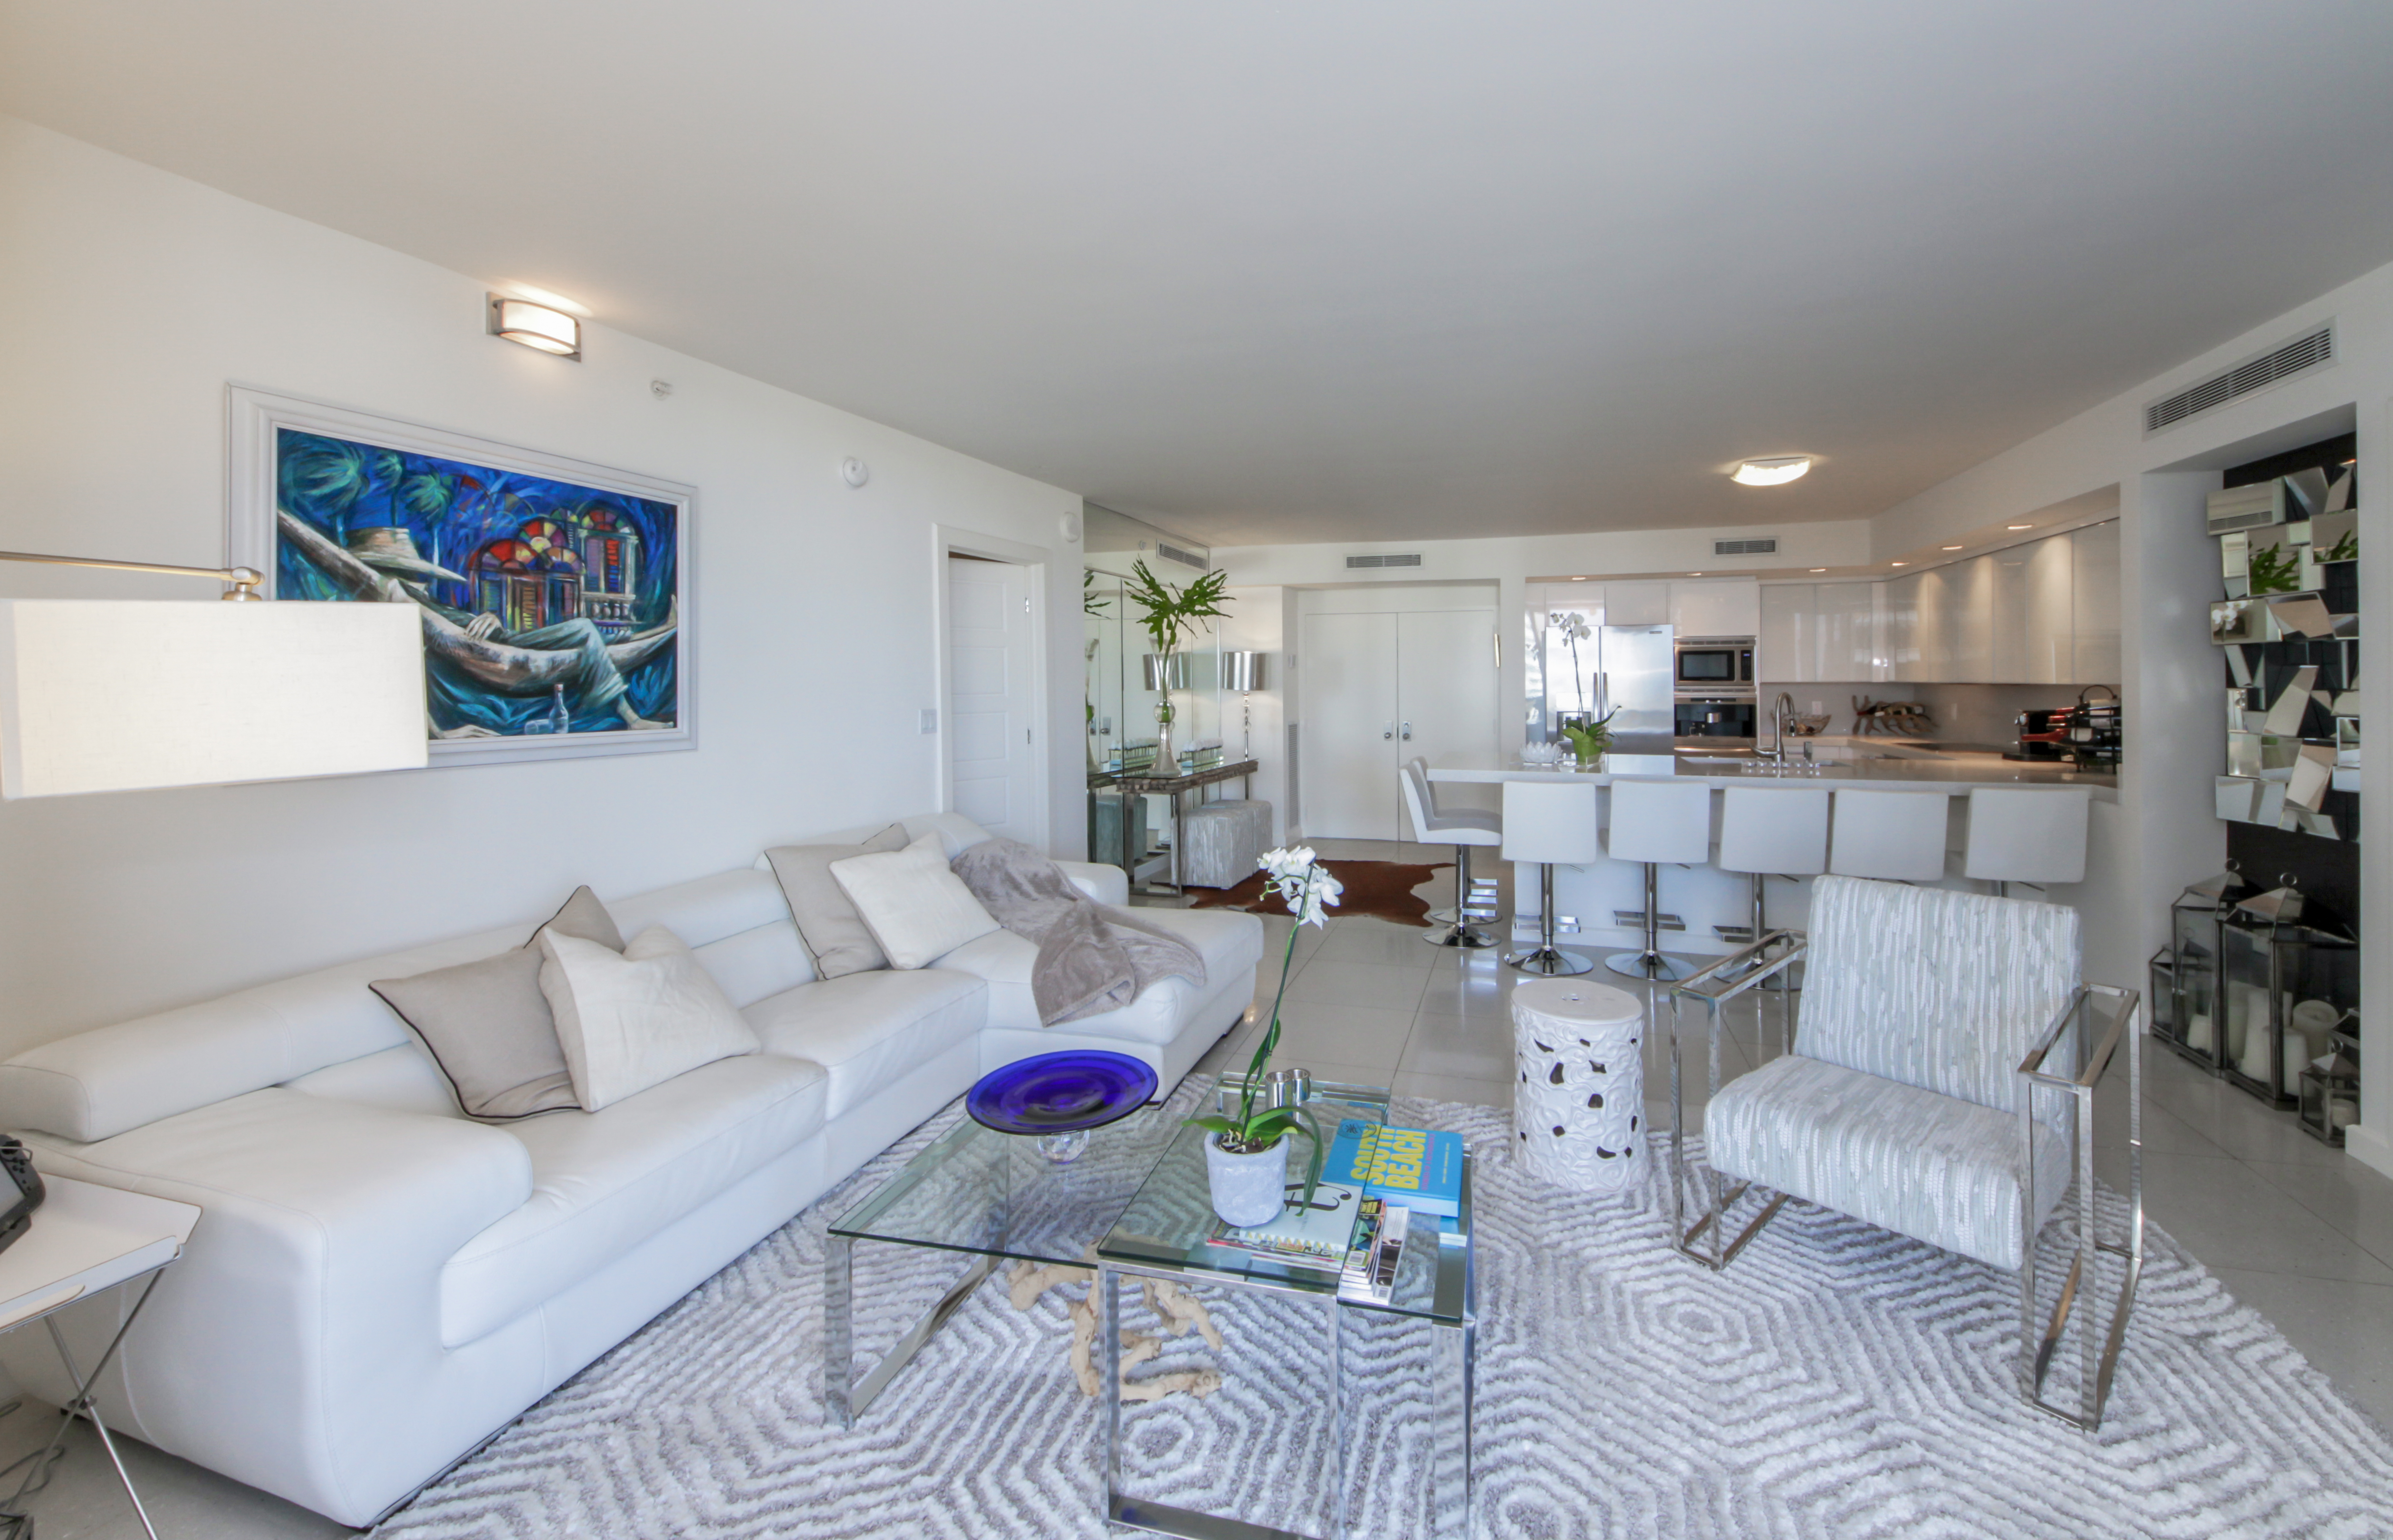 Condomínio para Venda às 9 Island Av #1411 9Island Av 1411 Miami Beach, Florida, 33139 Estados Unidos